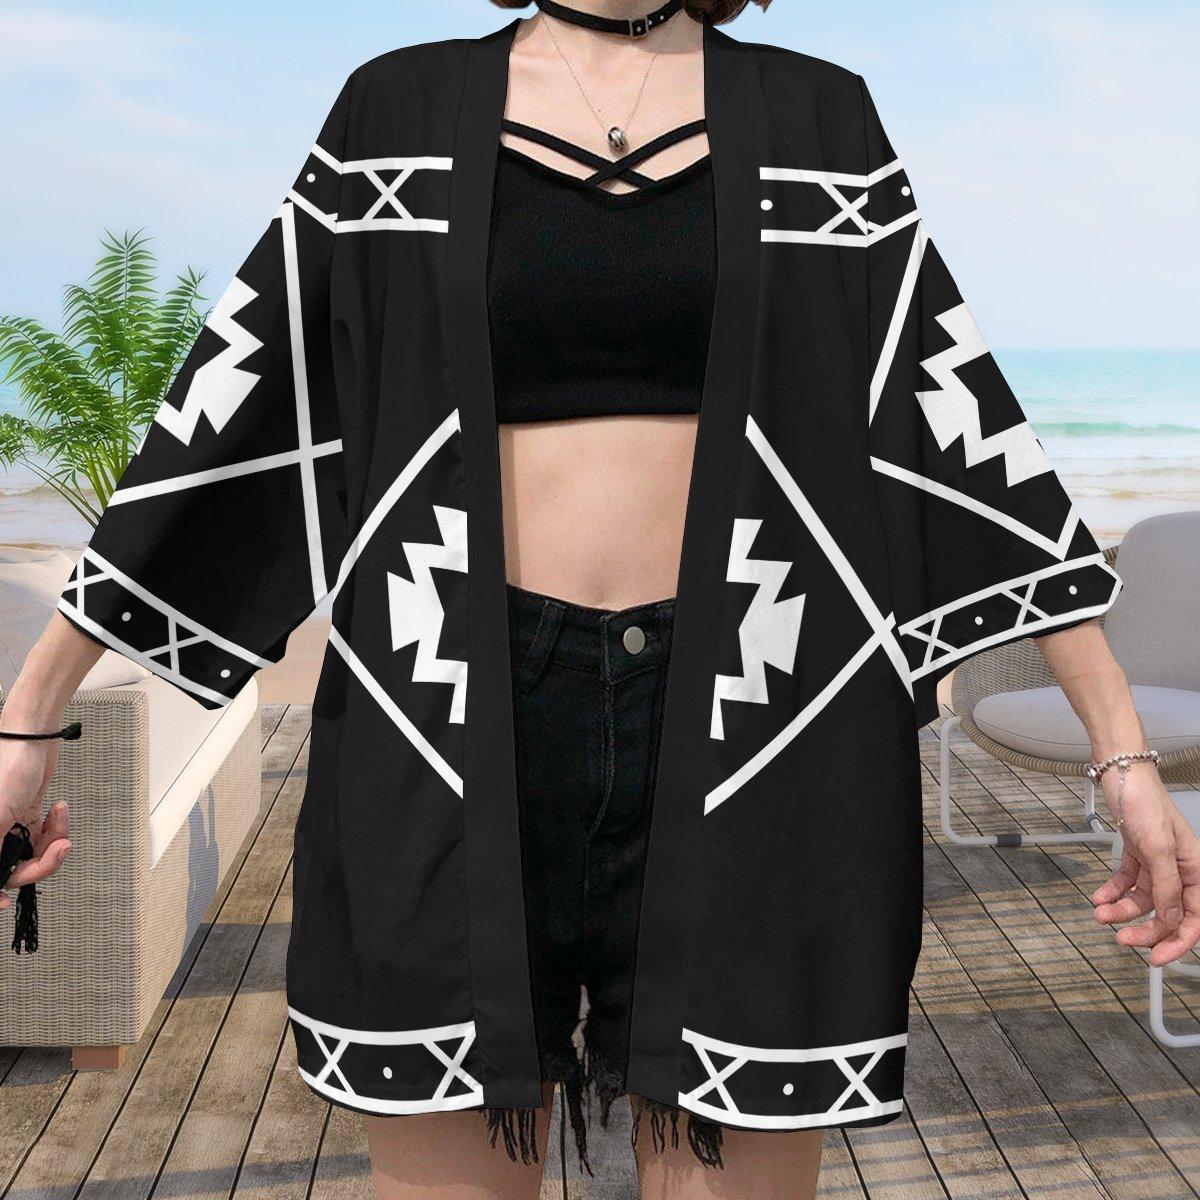 draken v2 kimono 161914 - Otaku Treat